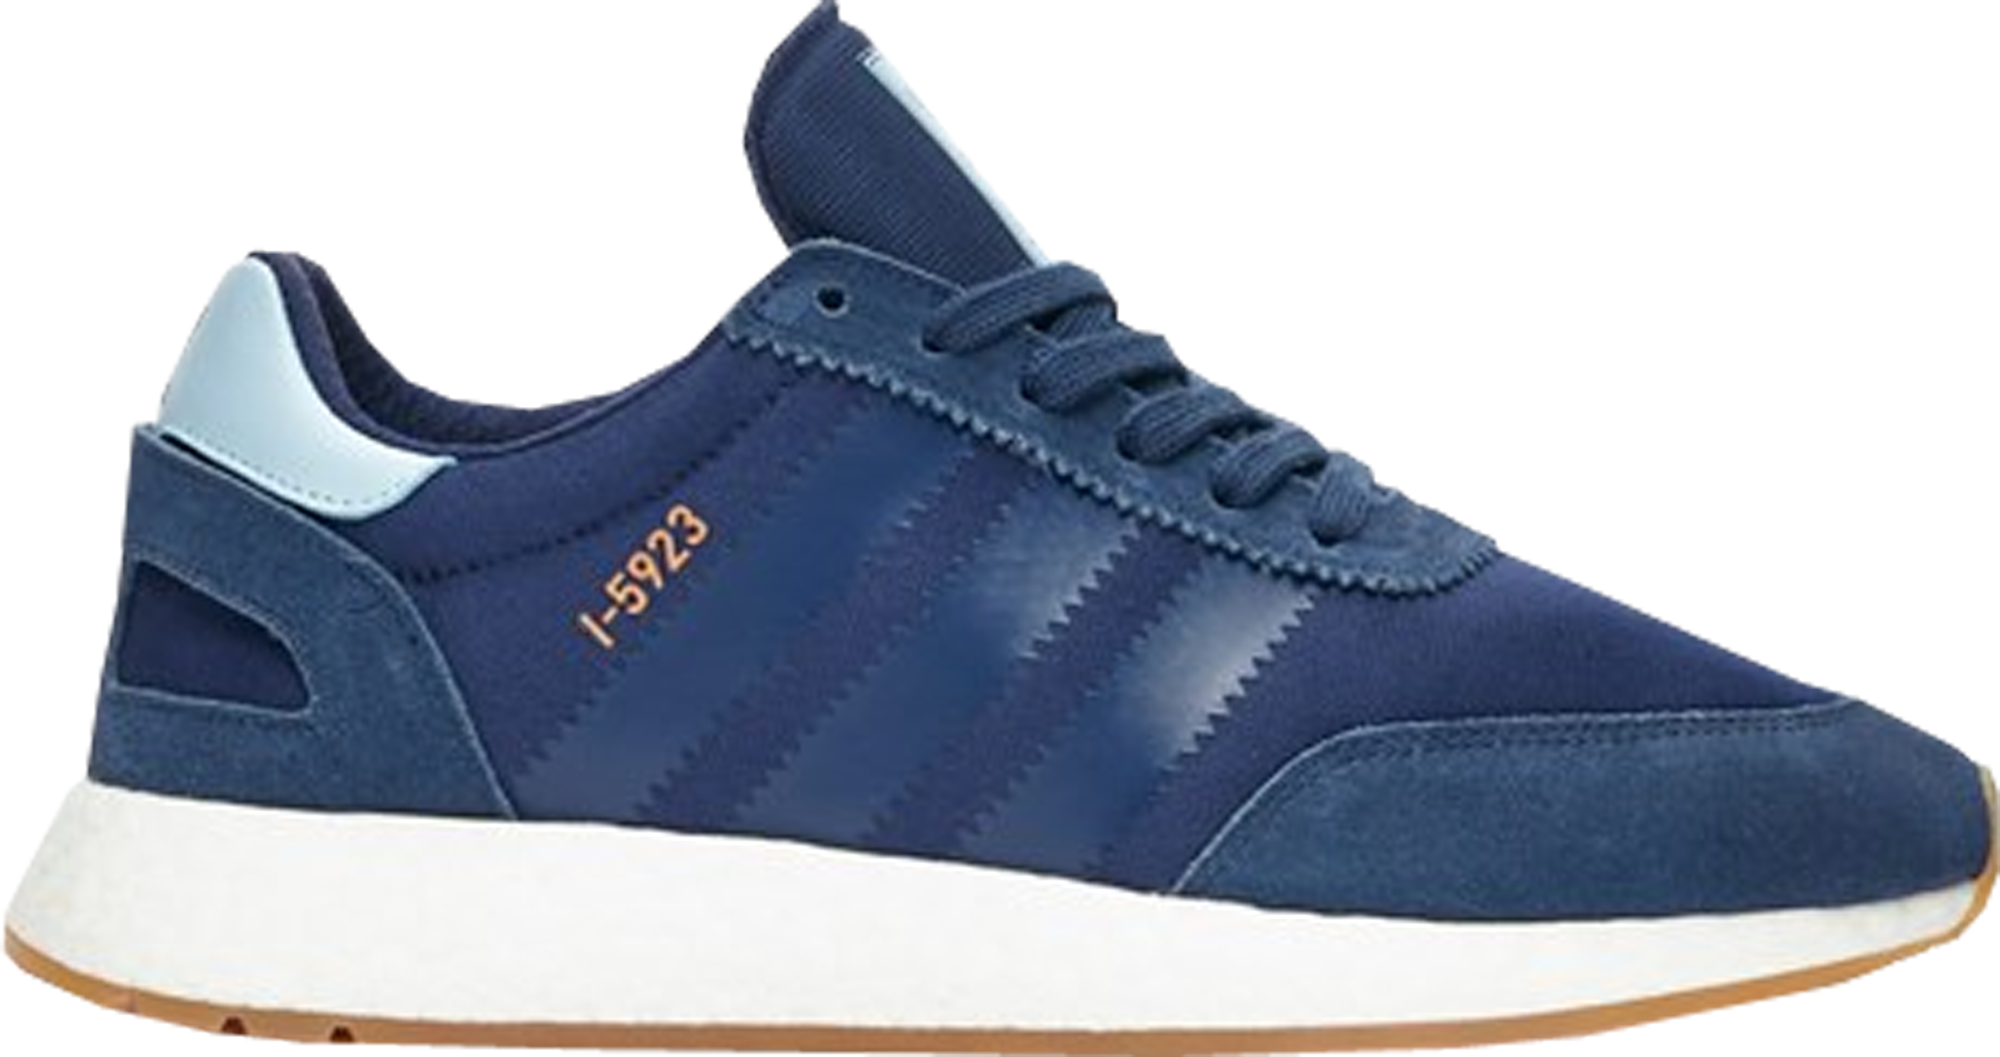 adidas I-5923 Sneakersnstuff Dark Blue